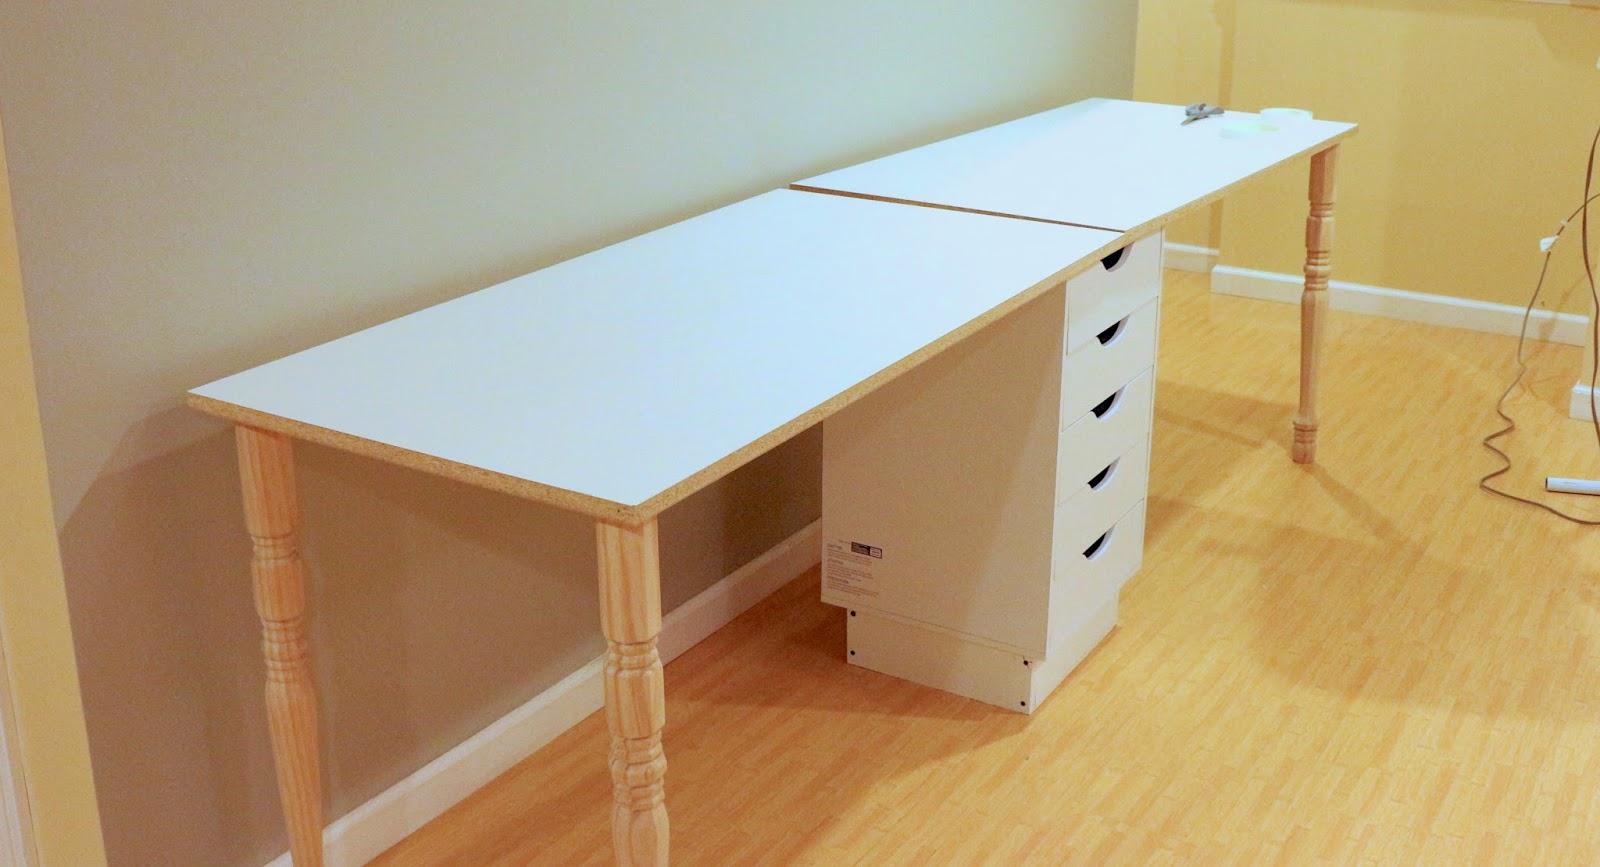 Home Depot Unfinished Upper Kitchen Cabinets